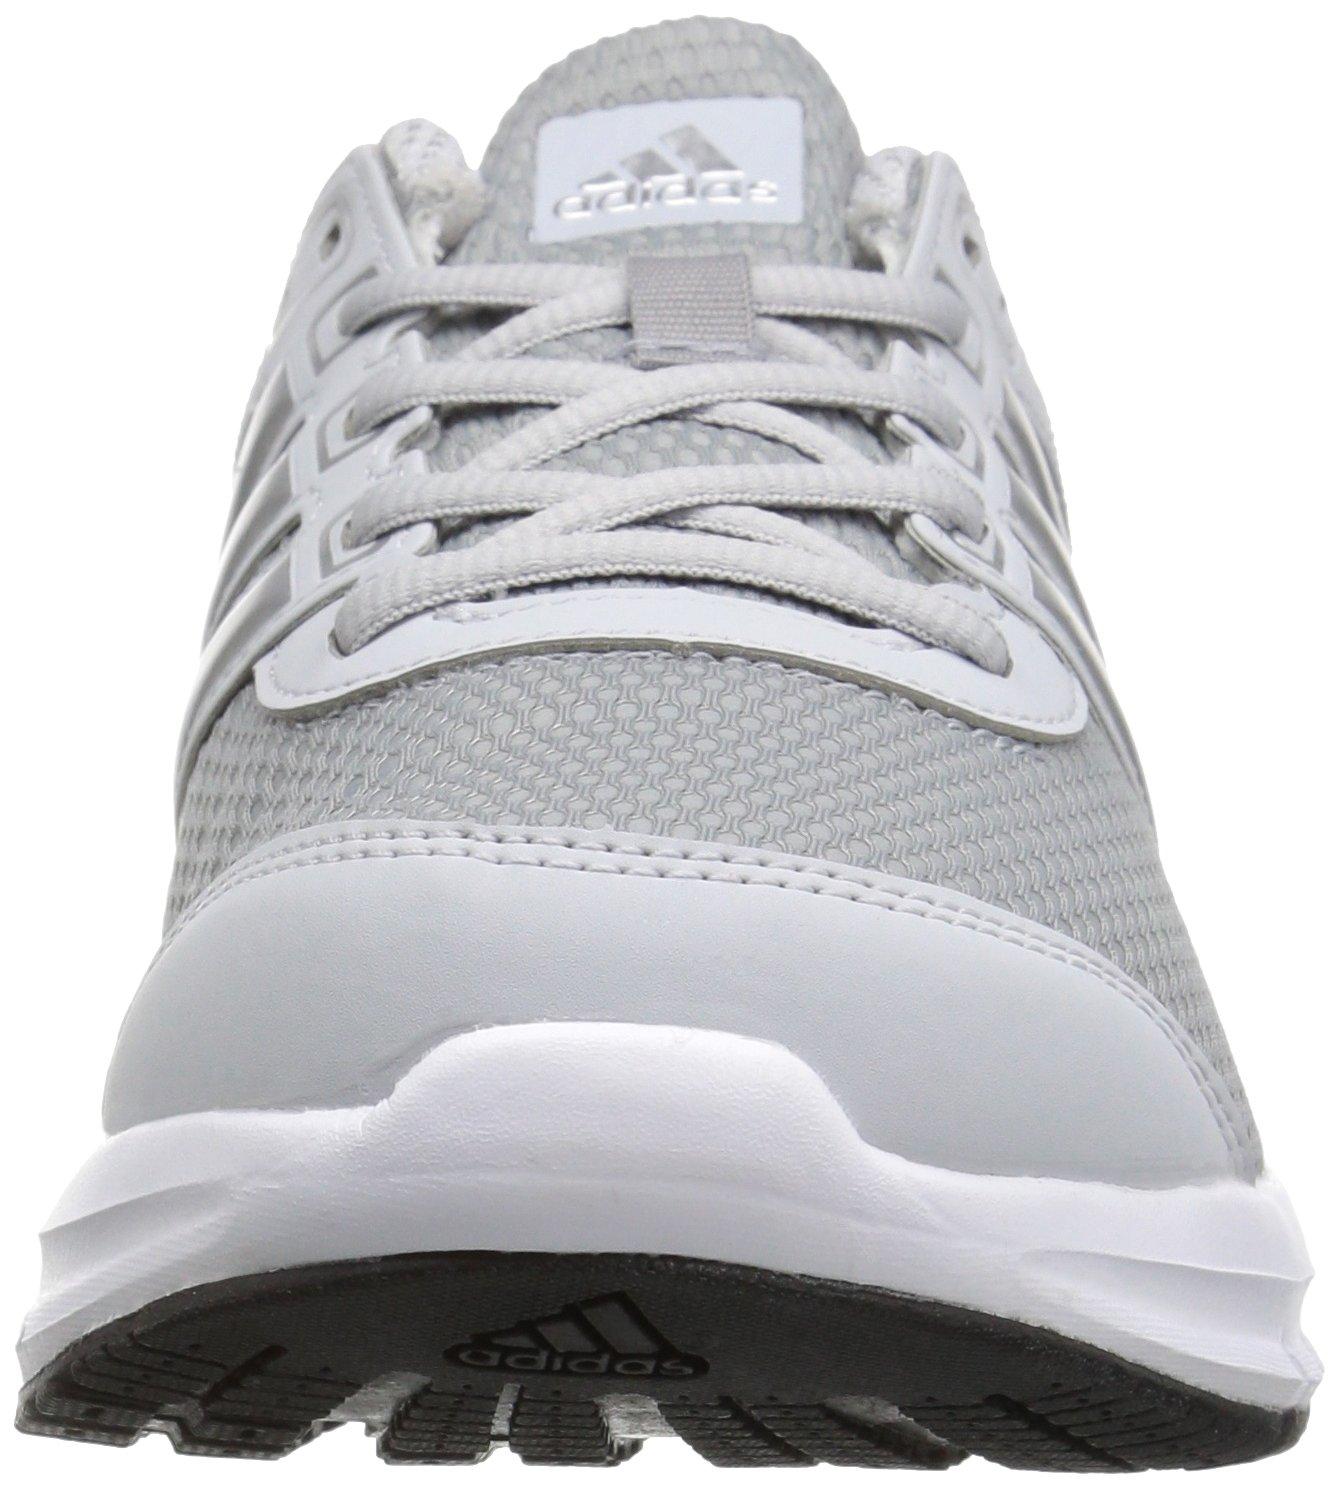 promo code 16dbf 91086 Zapatillas Running Hombre Adidas Duramo 6 M rojo solar negro blanco  Ref B40949